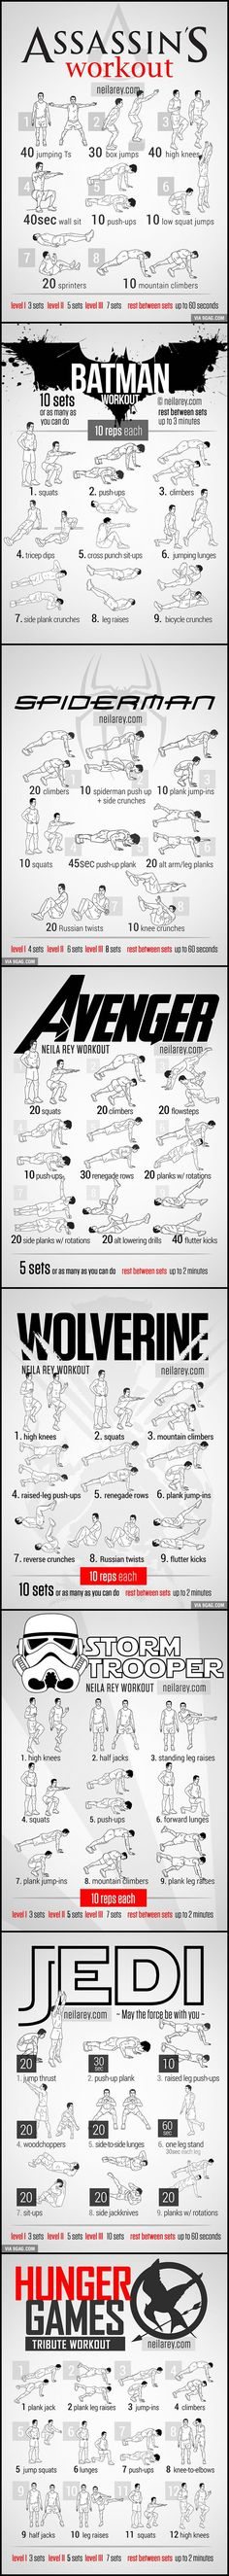 Workout for Assassin, Batman, Spiderman, Avenger, Wolverine, Stormtrooper, Jedi and Hunger Games!